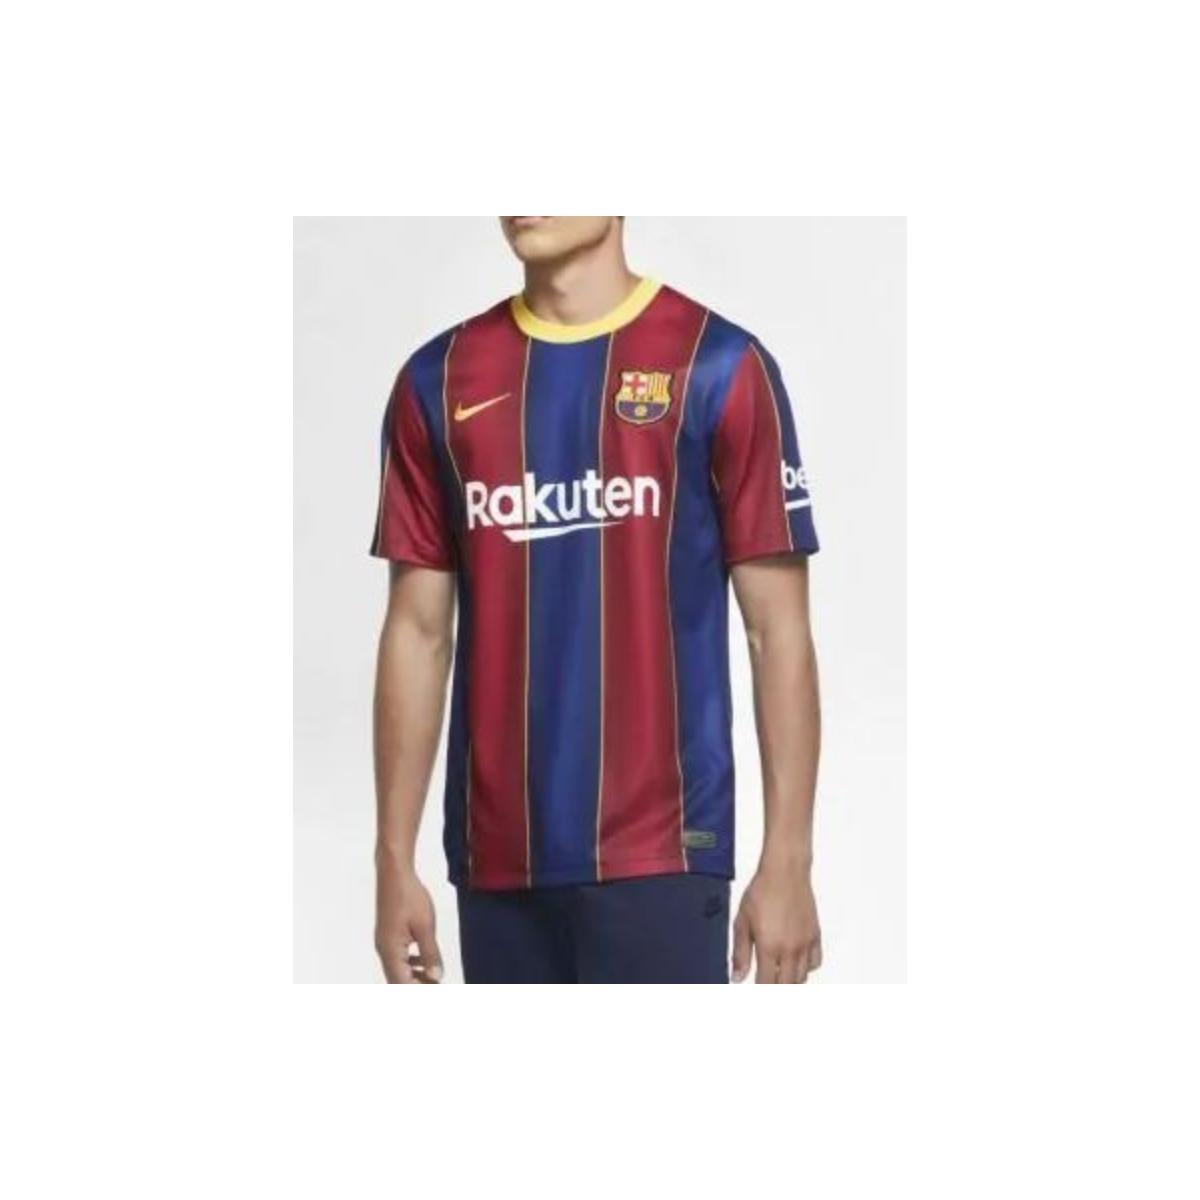 Camiseta Masculina Nike Cd4232-456 fc Barcelona Azul/bordo